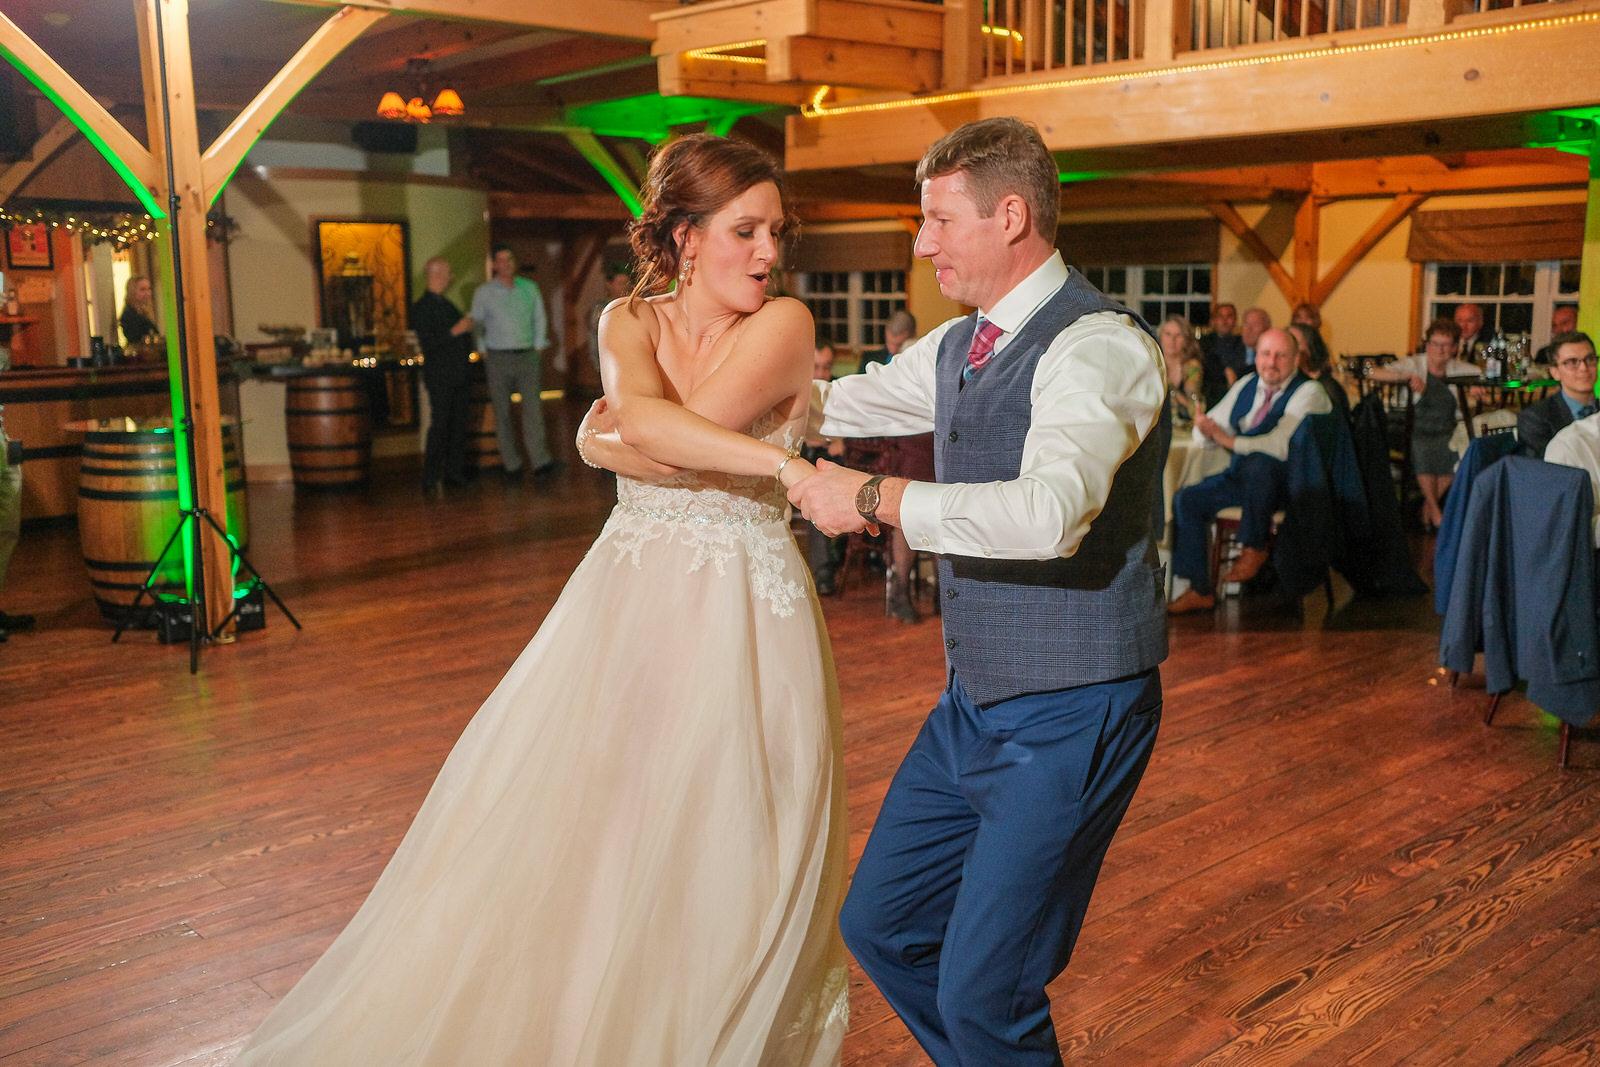 Zorvino-Vineyards-Fall-Wedding-Photography-801.jpg